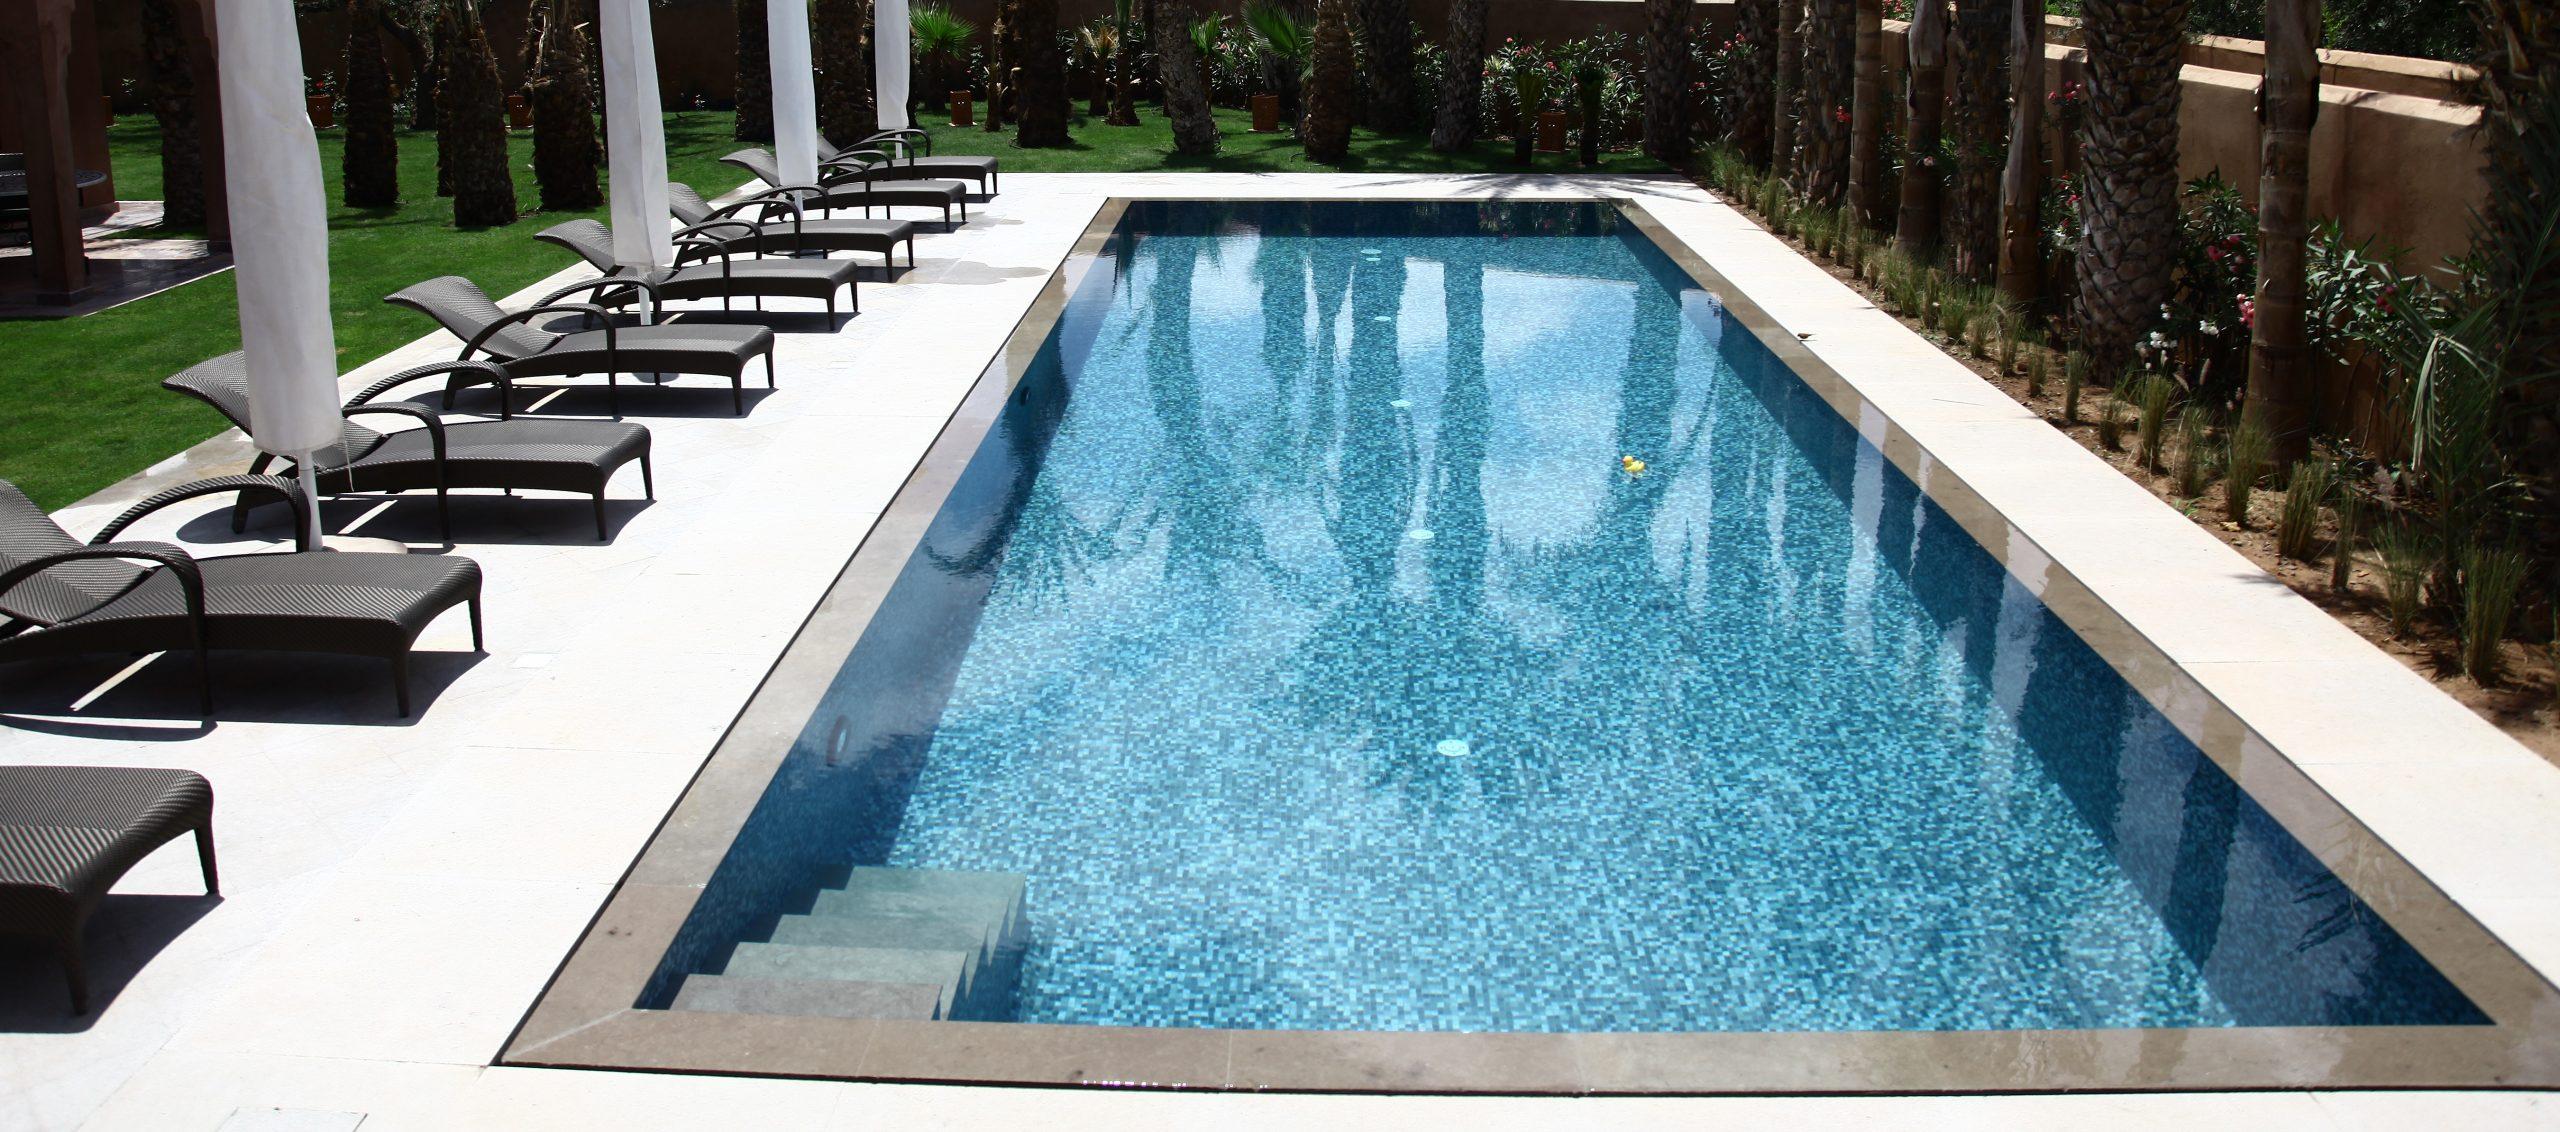 Quelle Piscine Choisir ?   Excellence Swimming Pool And Spa intérieur Quelle Piscine Choisir